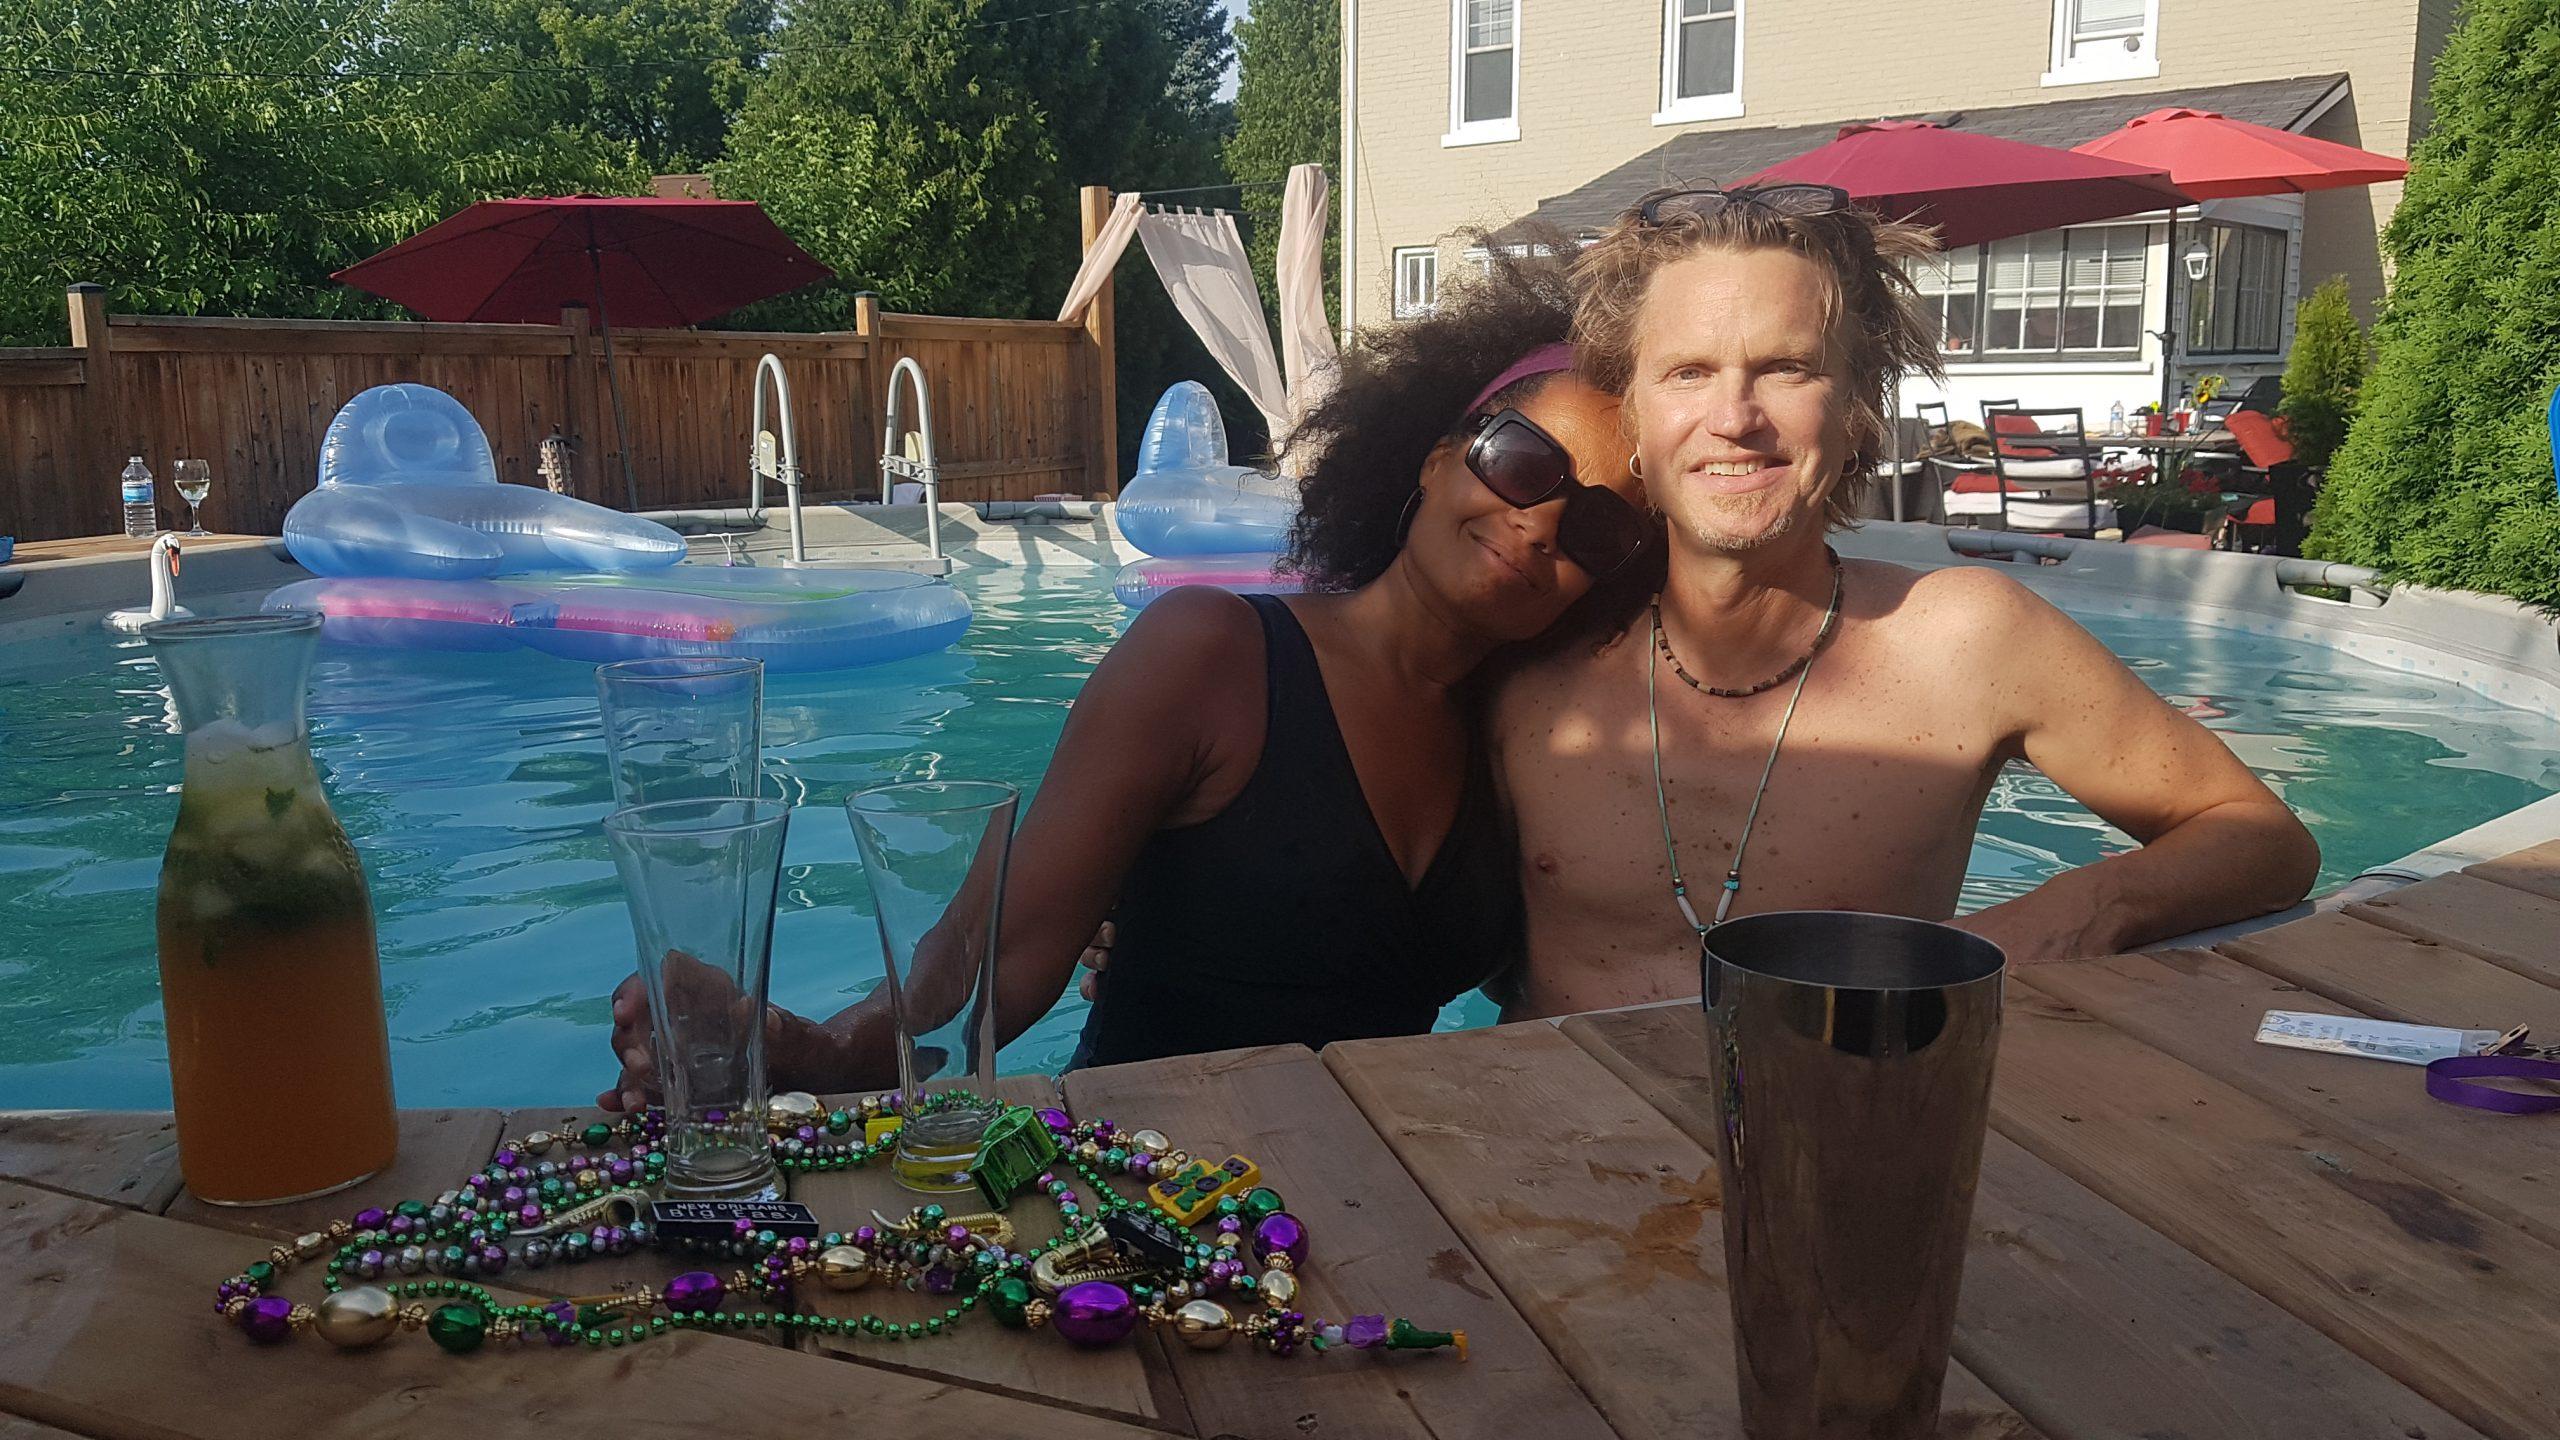 Juliet Dunn and Peter Shea - Niagara's ONLINE Summer Mardi Gras - Saturday, July 18, 2020. Photo: Nicholas Paolone